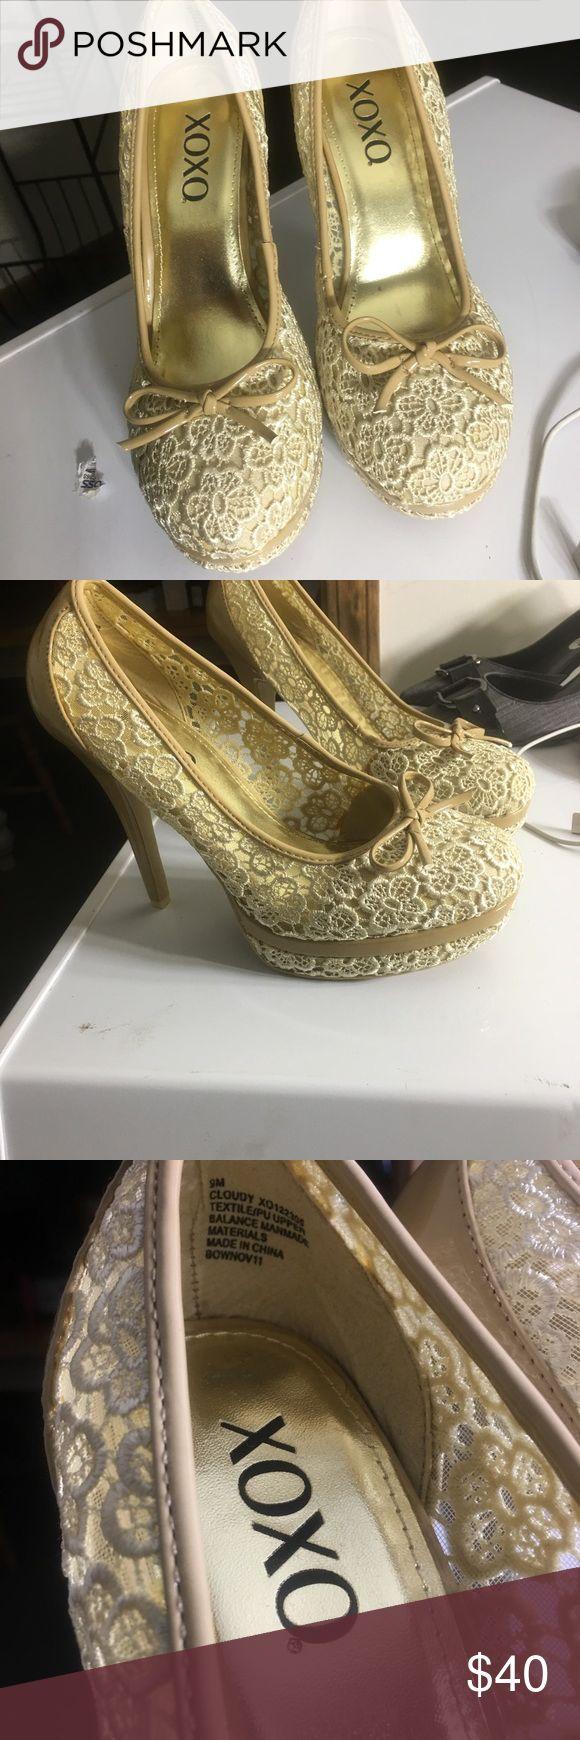 Lace Cream high heels  worn 1x.  Size 9 Super cute size 9 lace cream high heels worn only once. XOXO Shoes Heels